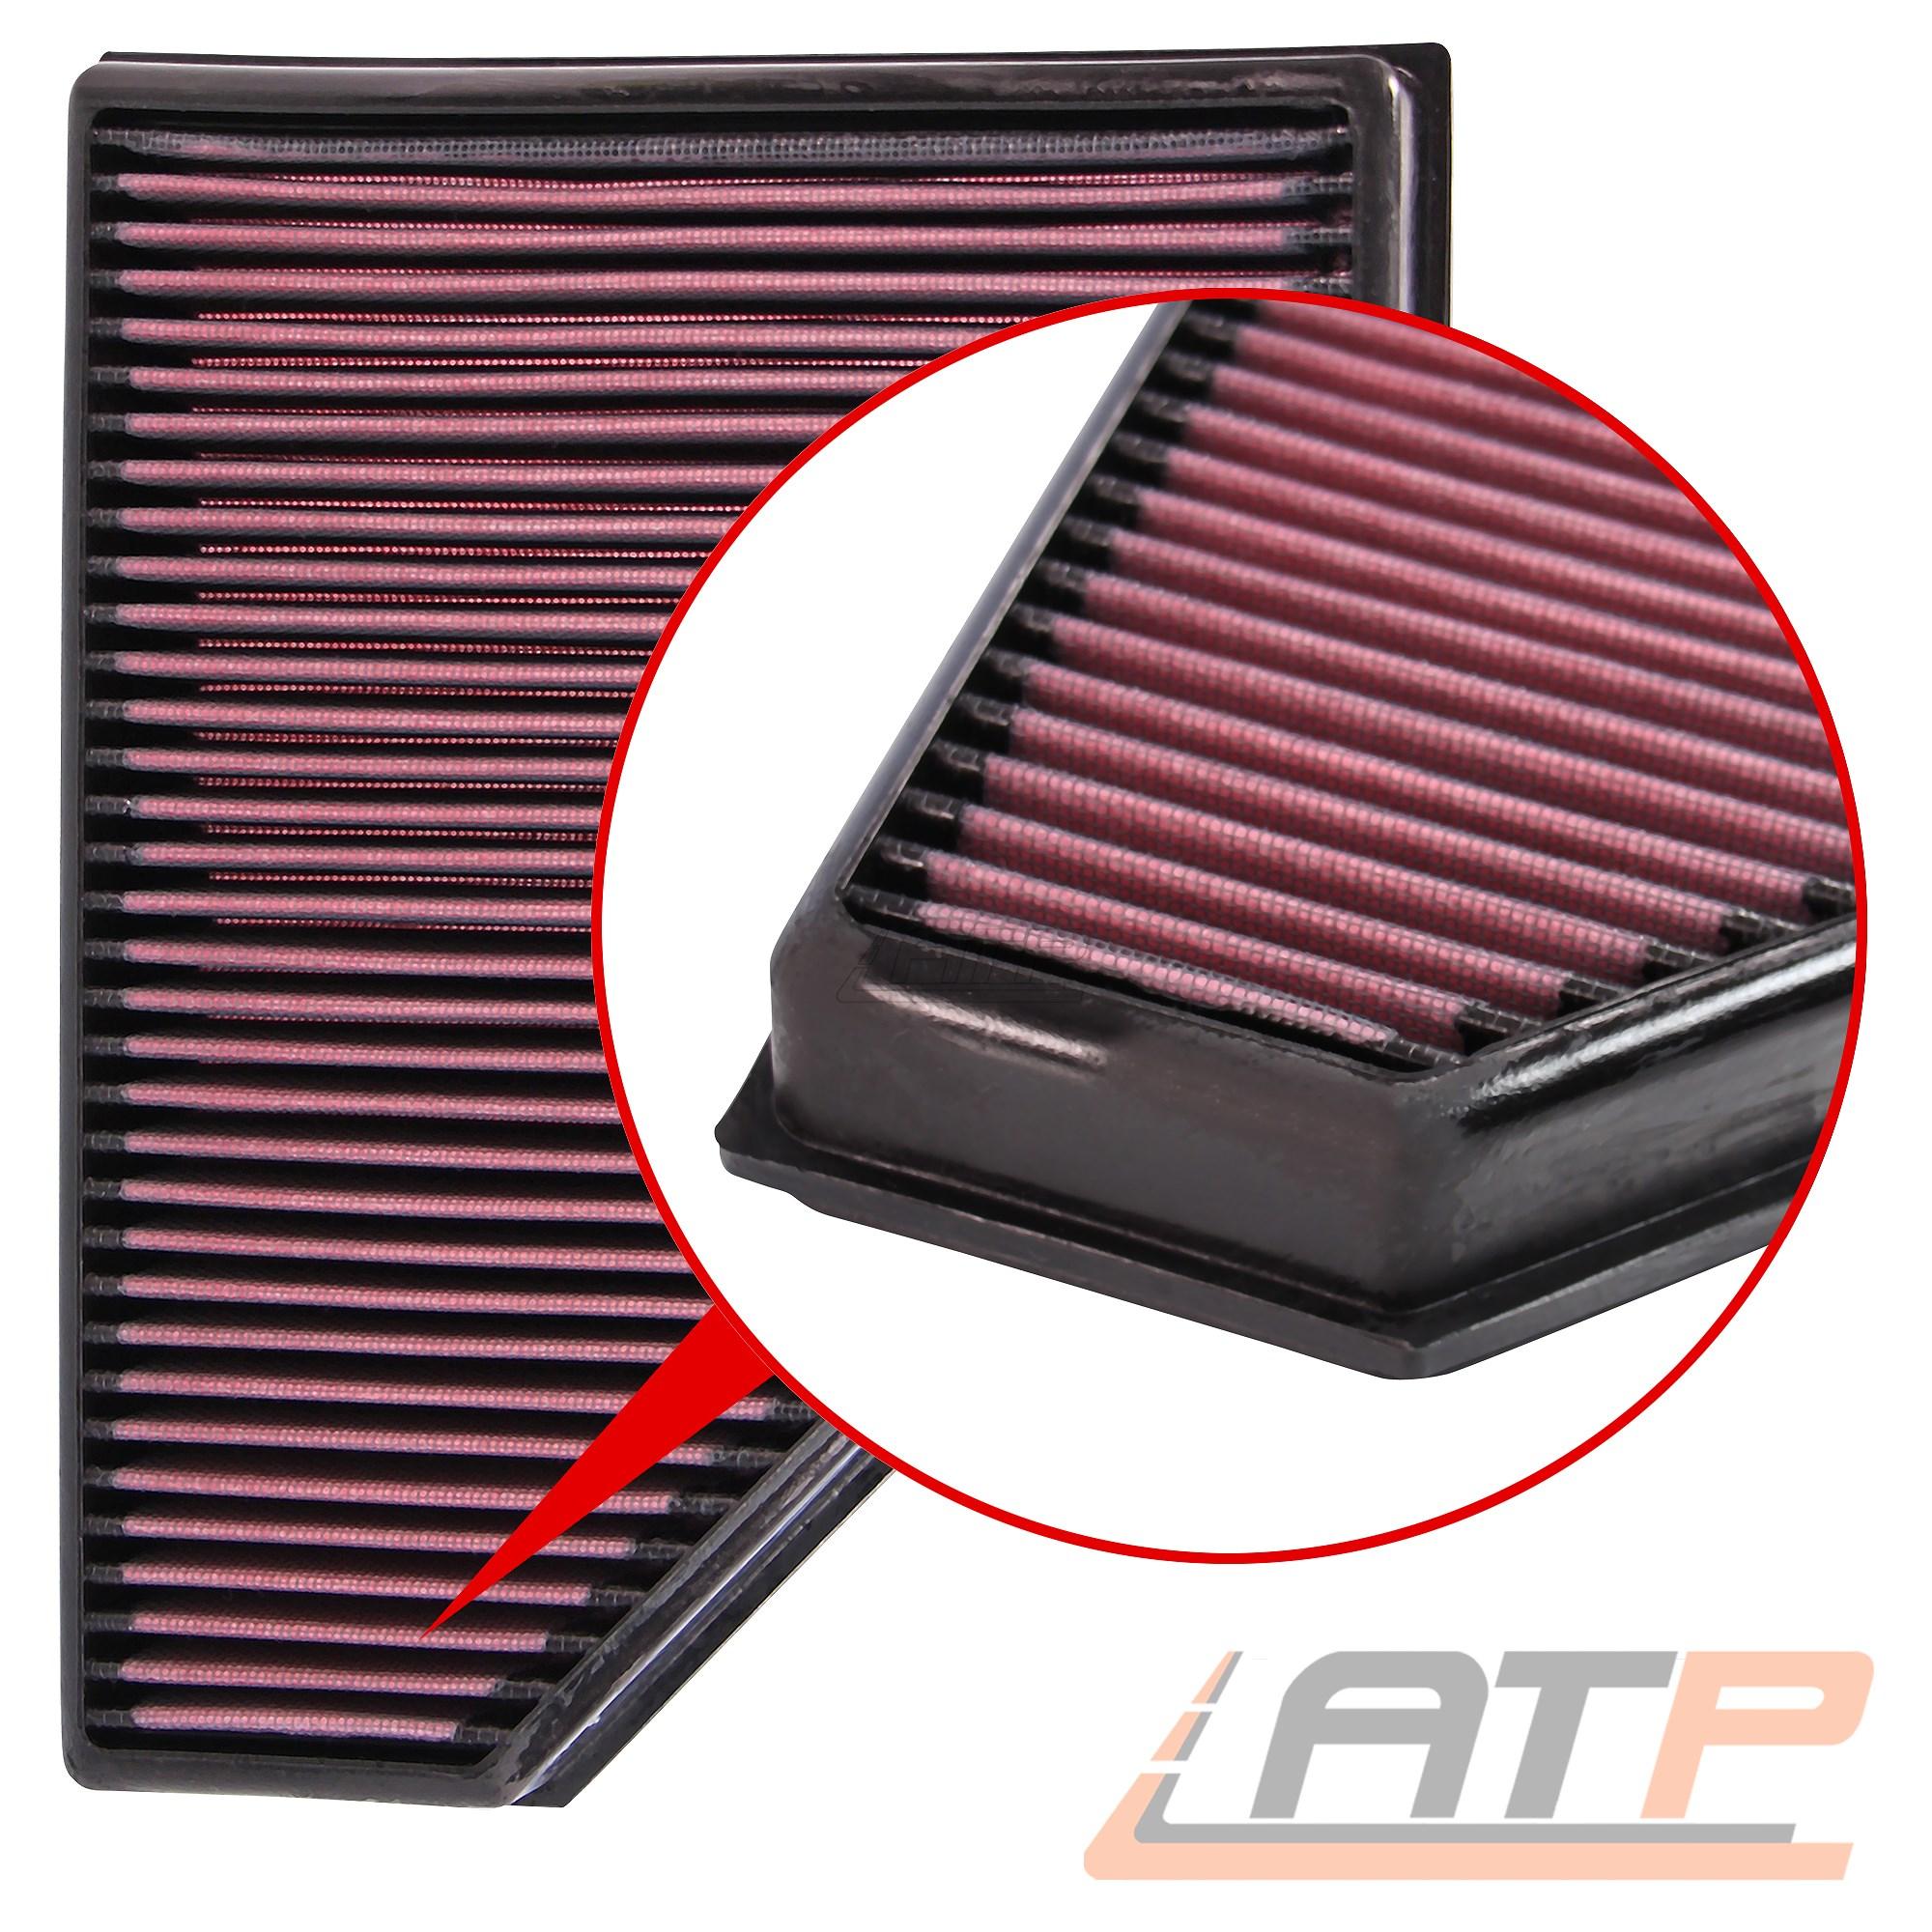 K /& N Filtre à air sport filtre à air sport filtre d/'échange sport Filtre Air Filter 33-2942